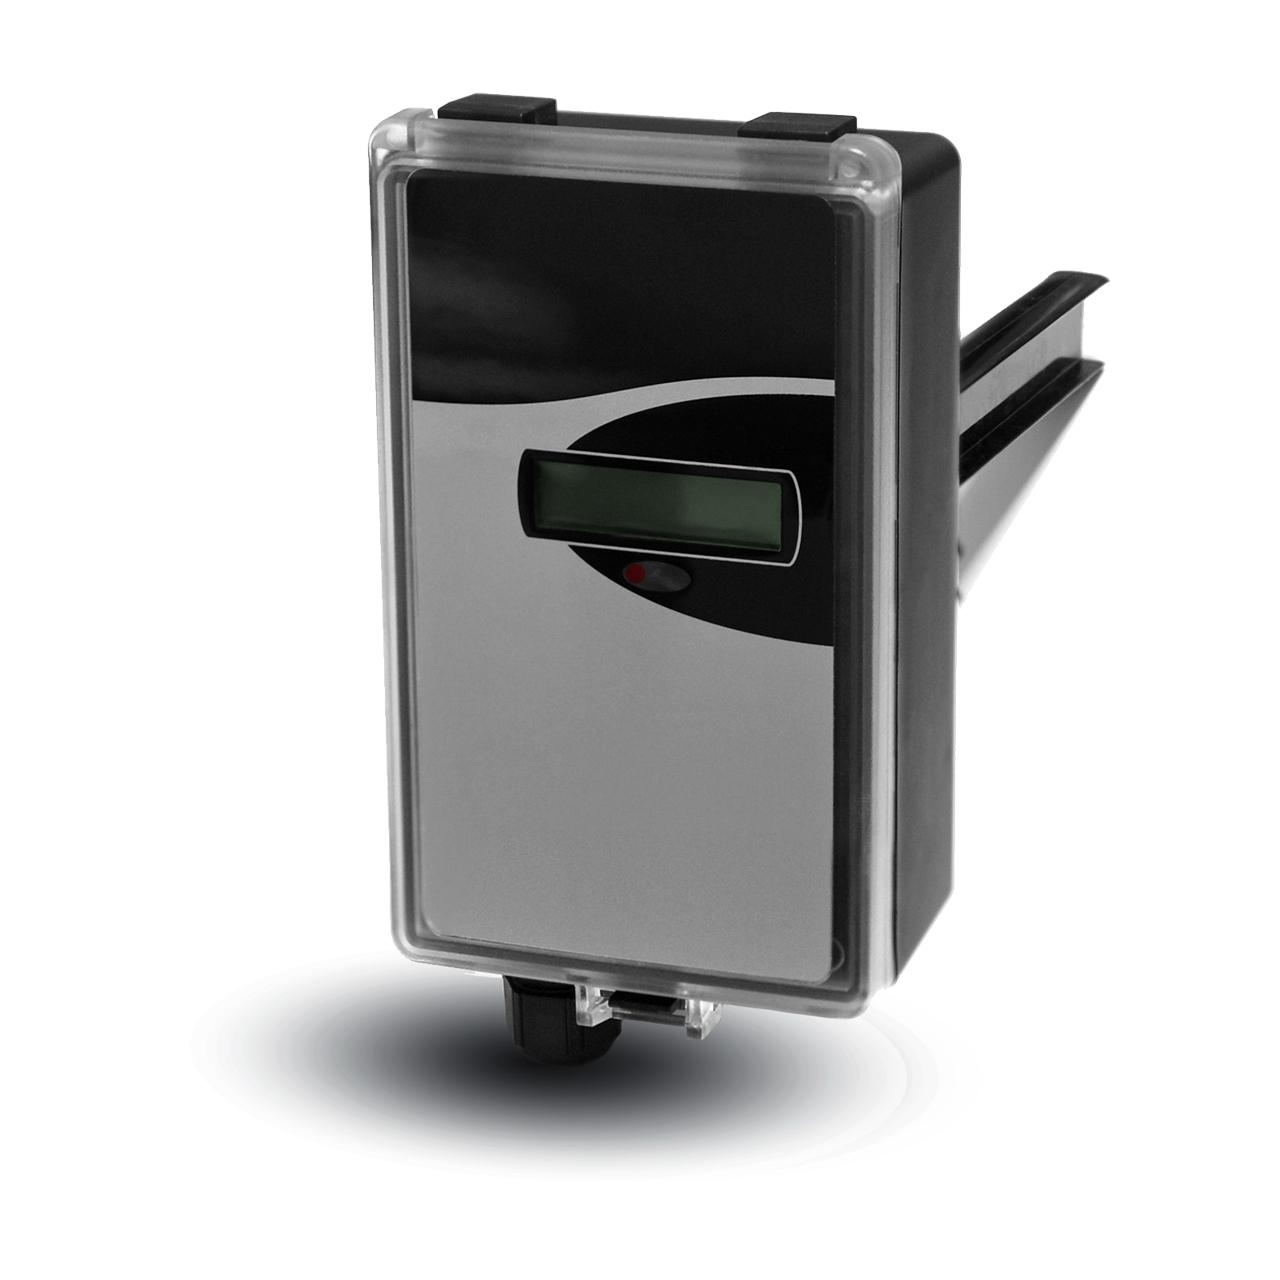 carrier-NSA-ASENSE-CO2-DUCT-duct-sensor